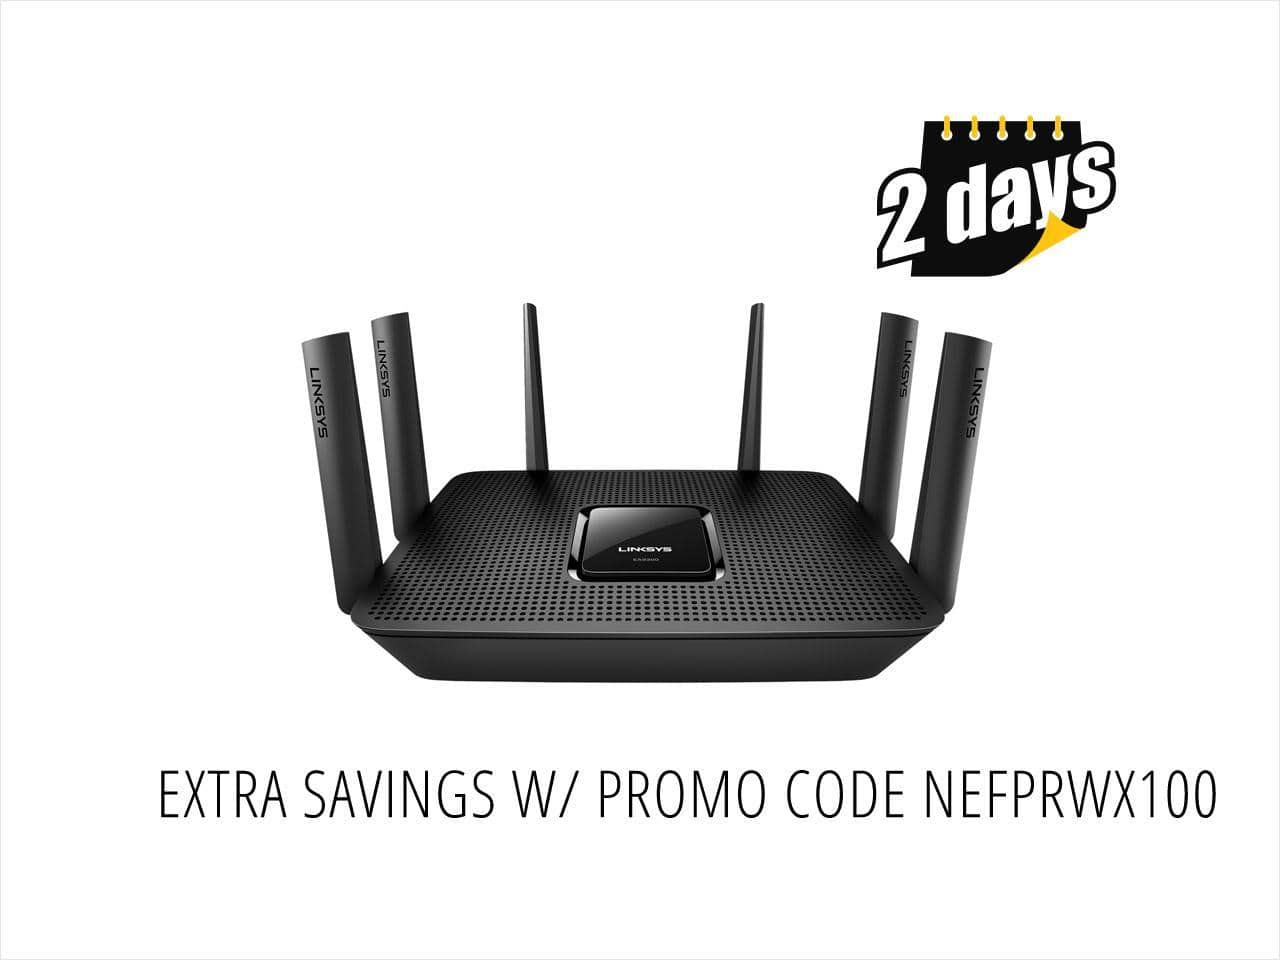 Linksys Max-Stream AC4000 MU-MIMO Wi-Fi Tri-Band Router $200AC @NF